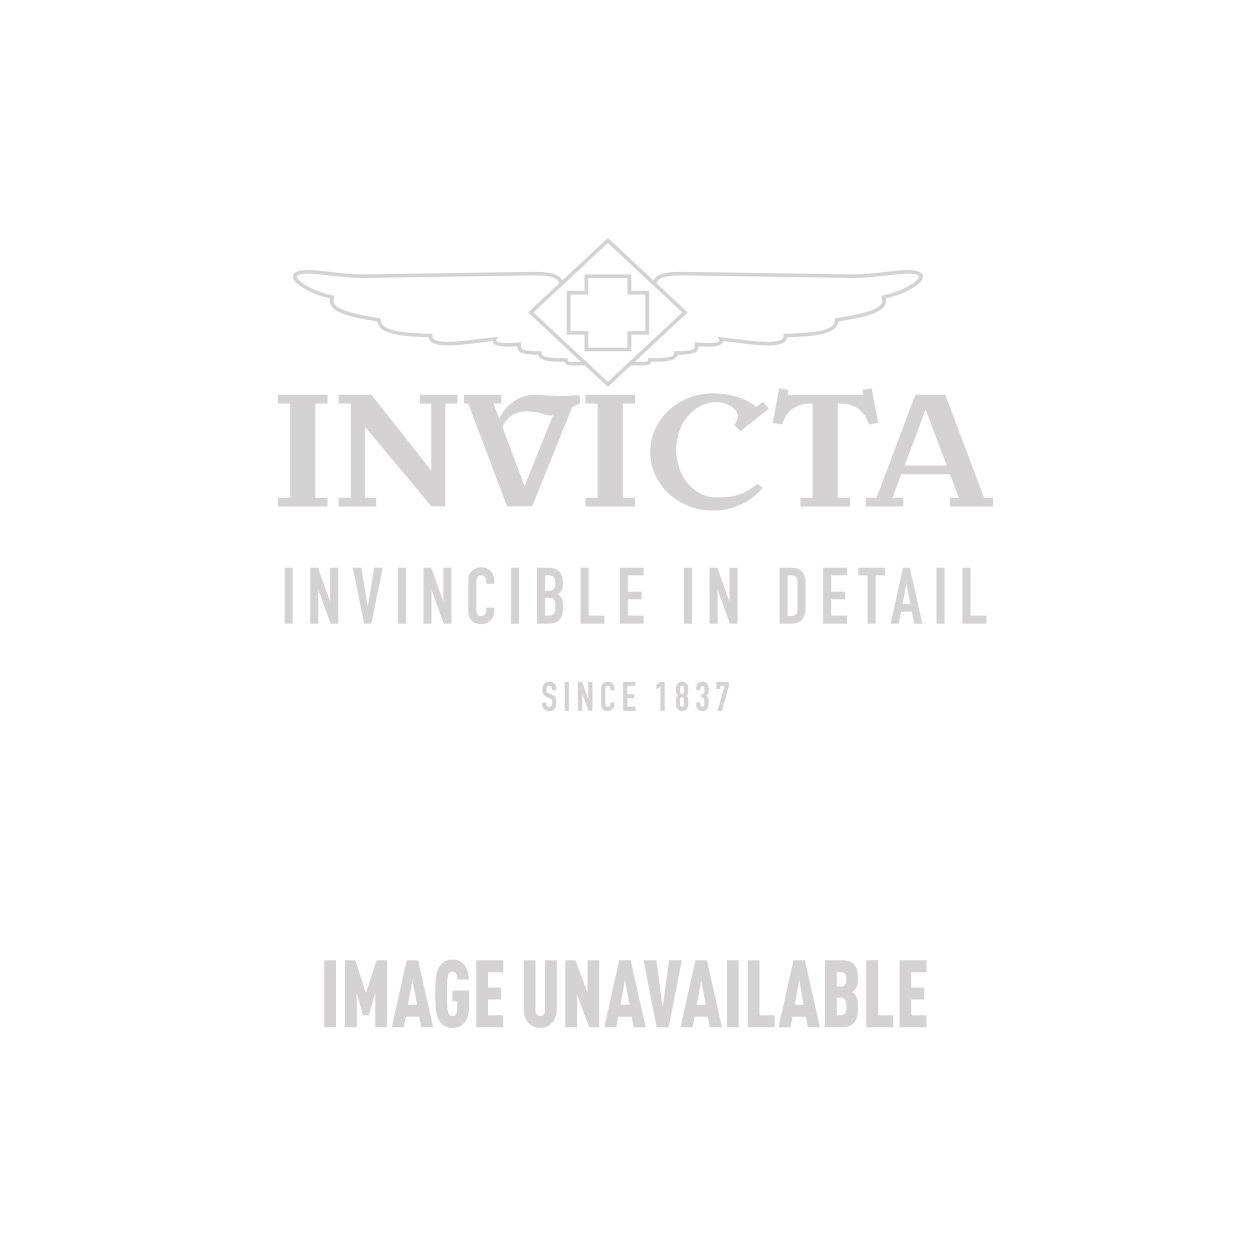 Invicta Venom  Quartz Watch - Rose Gold, Black case with Rose Gold, Black tone Stainless Steel band - Model 5728